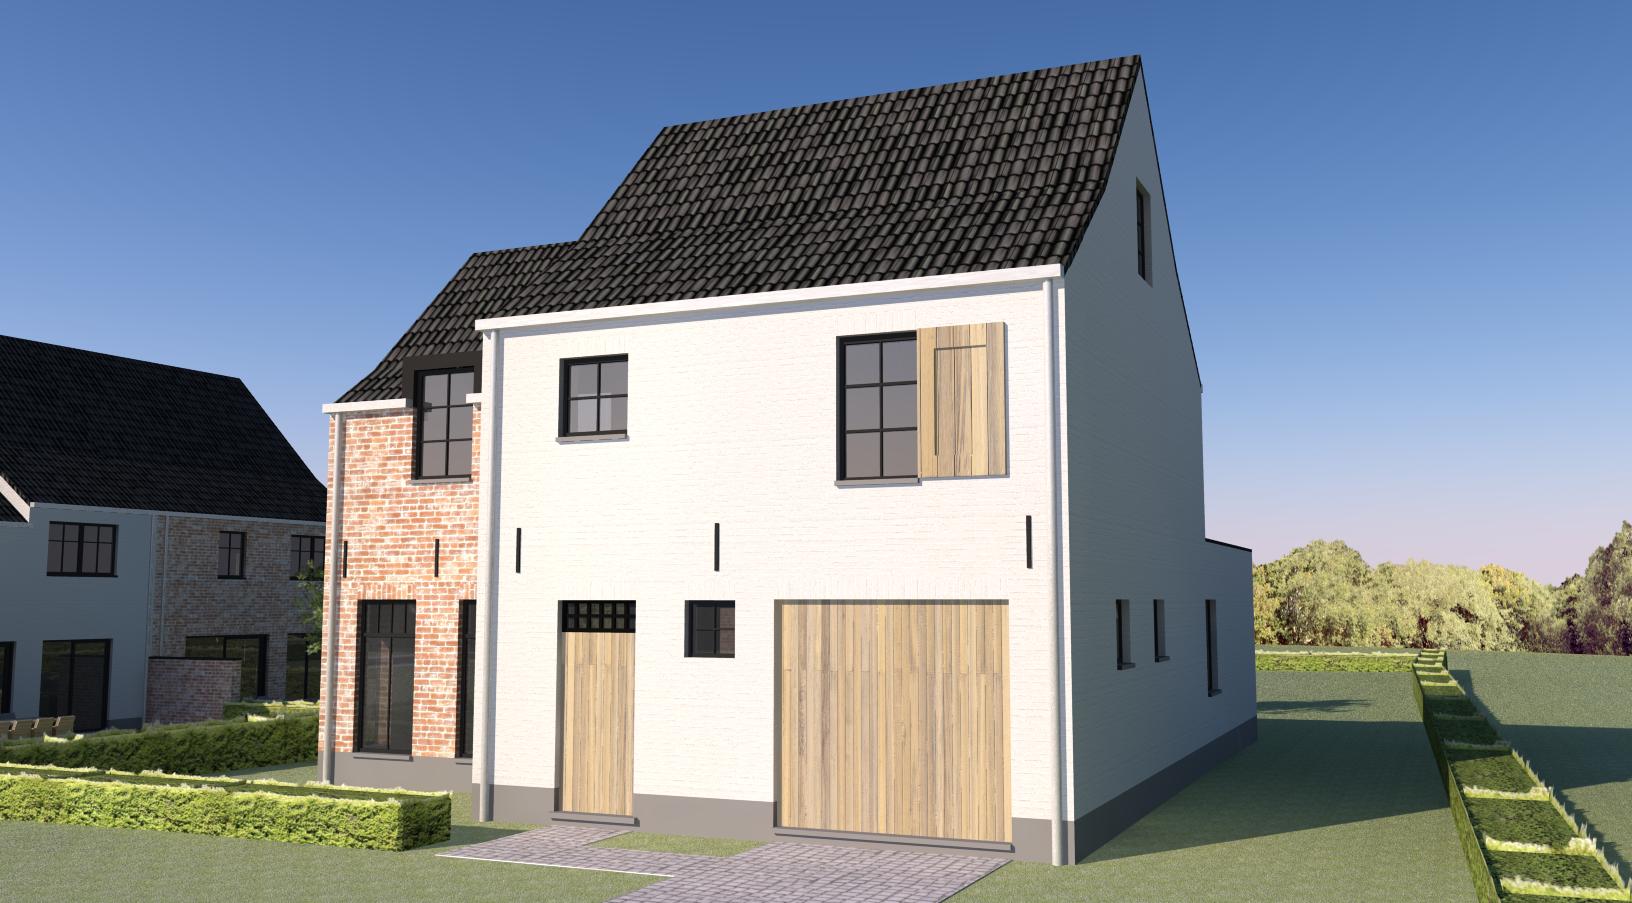 Lot 4 – Holsbeek – alleenstaande woning >>